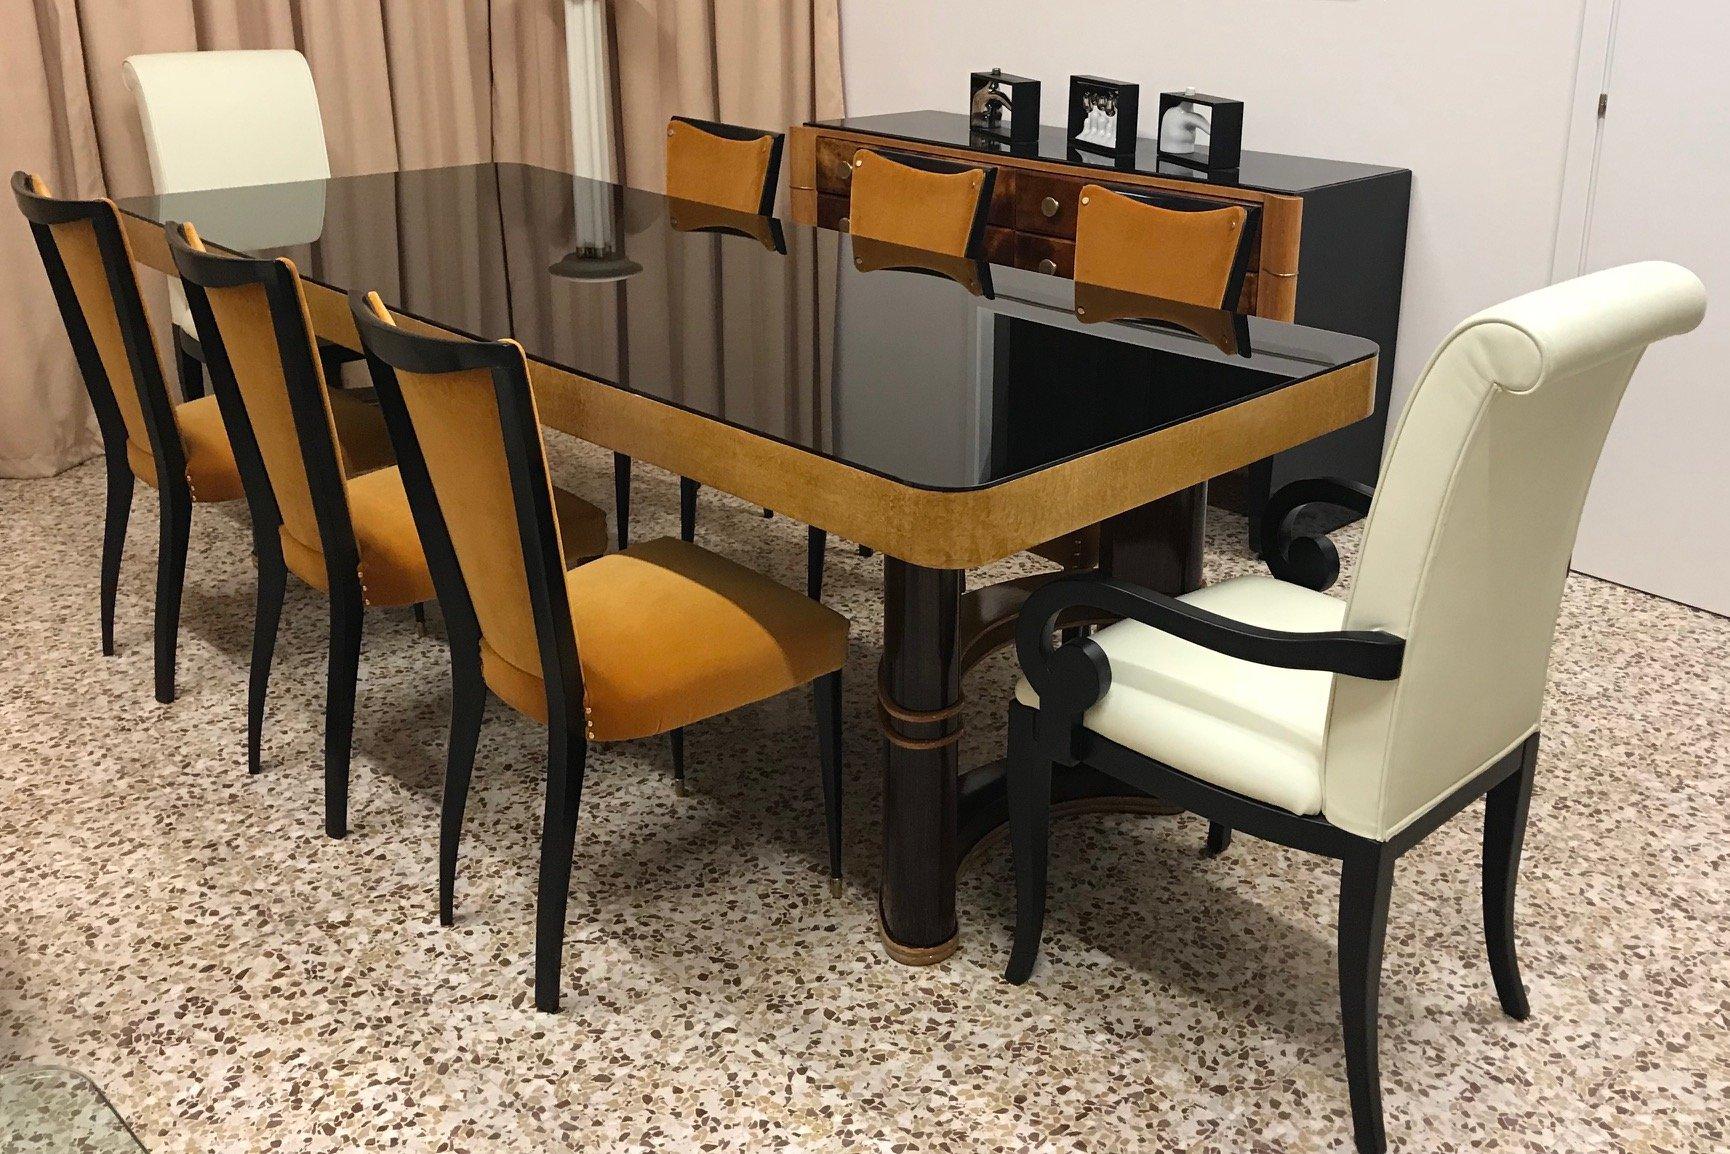 Vintage Italian Dining Table 1940s 6 1393500 Price Per Piece